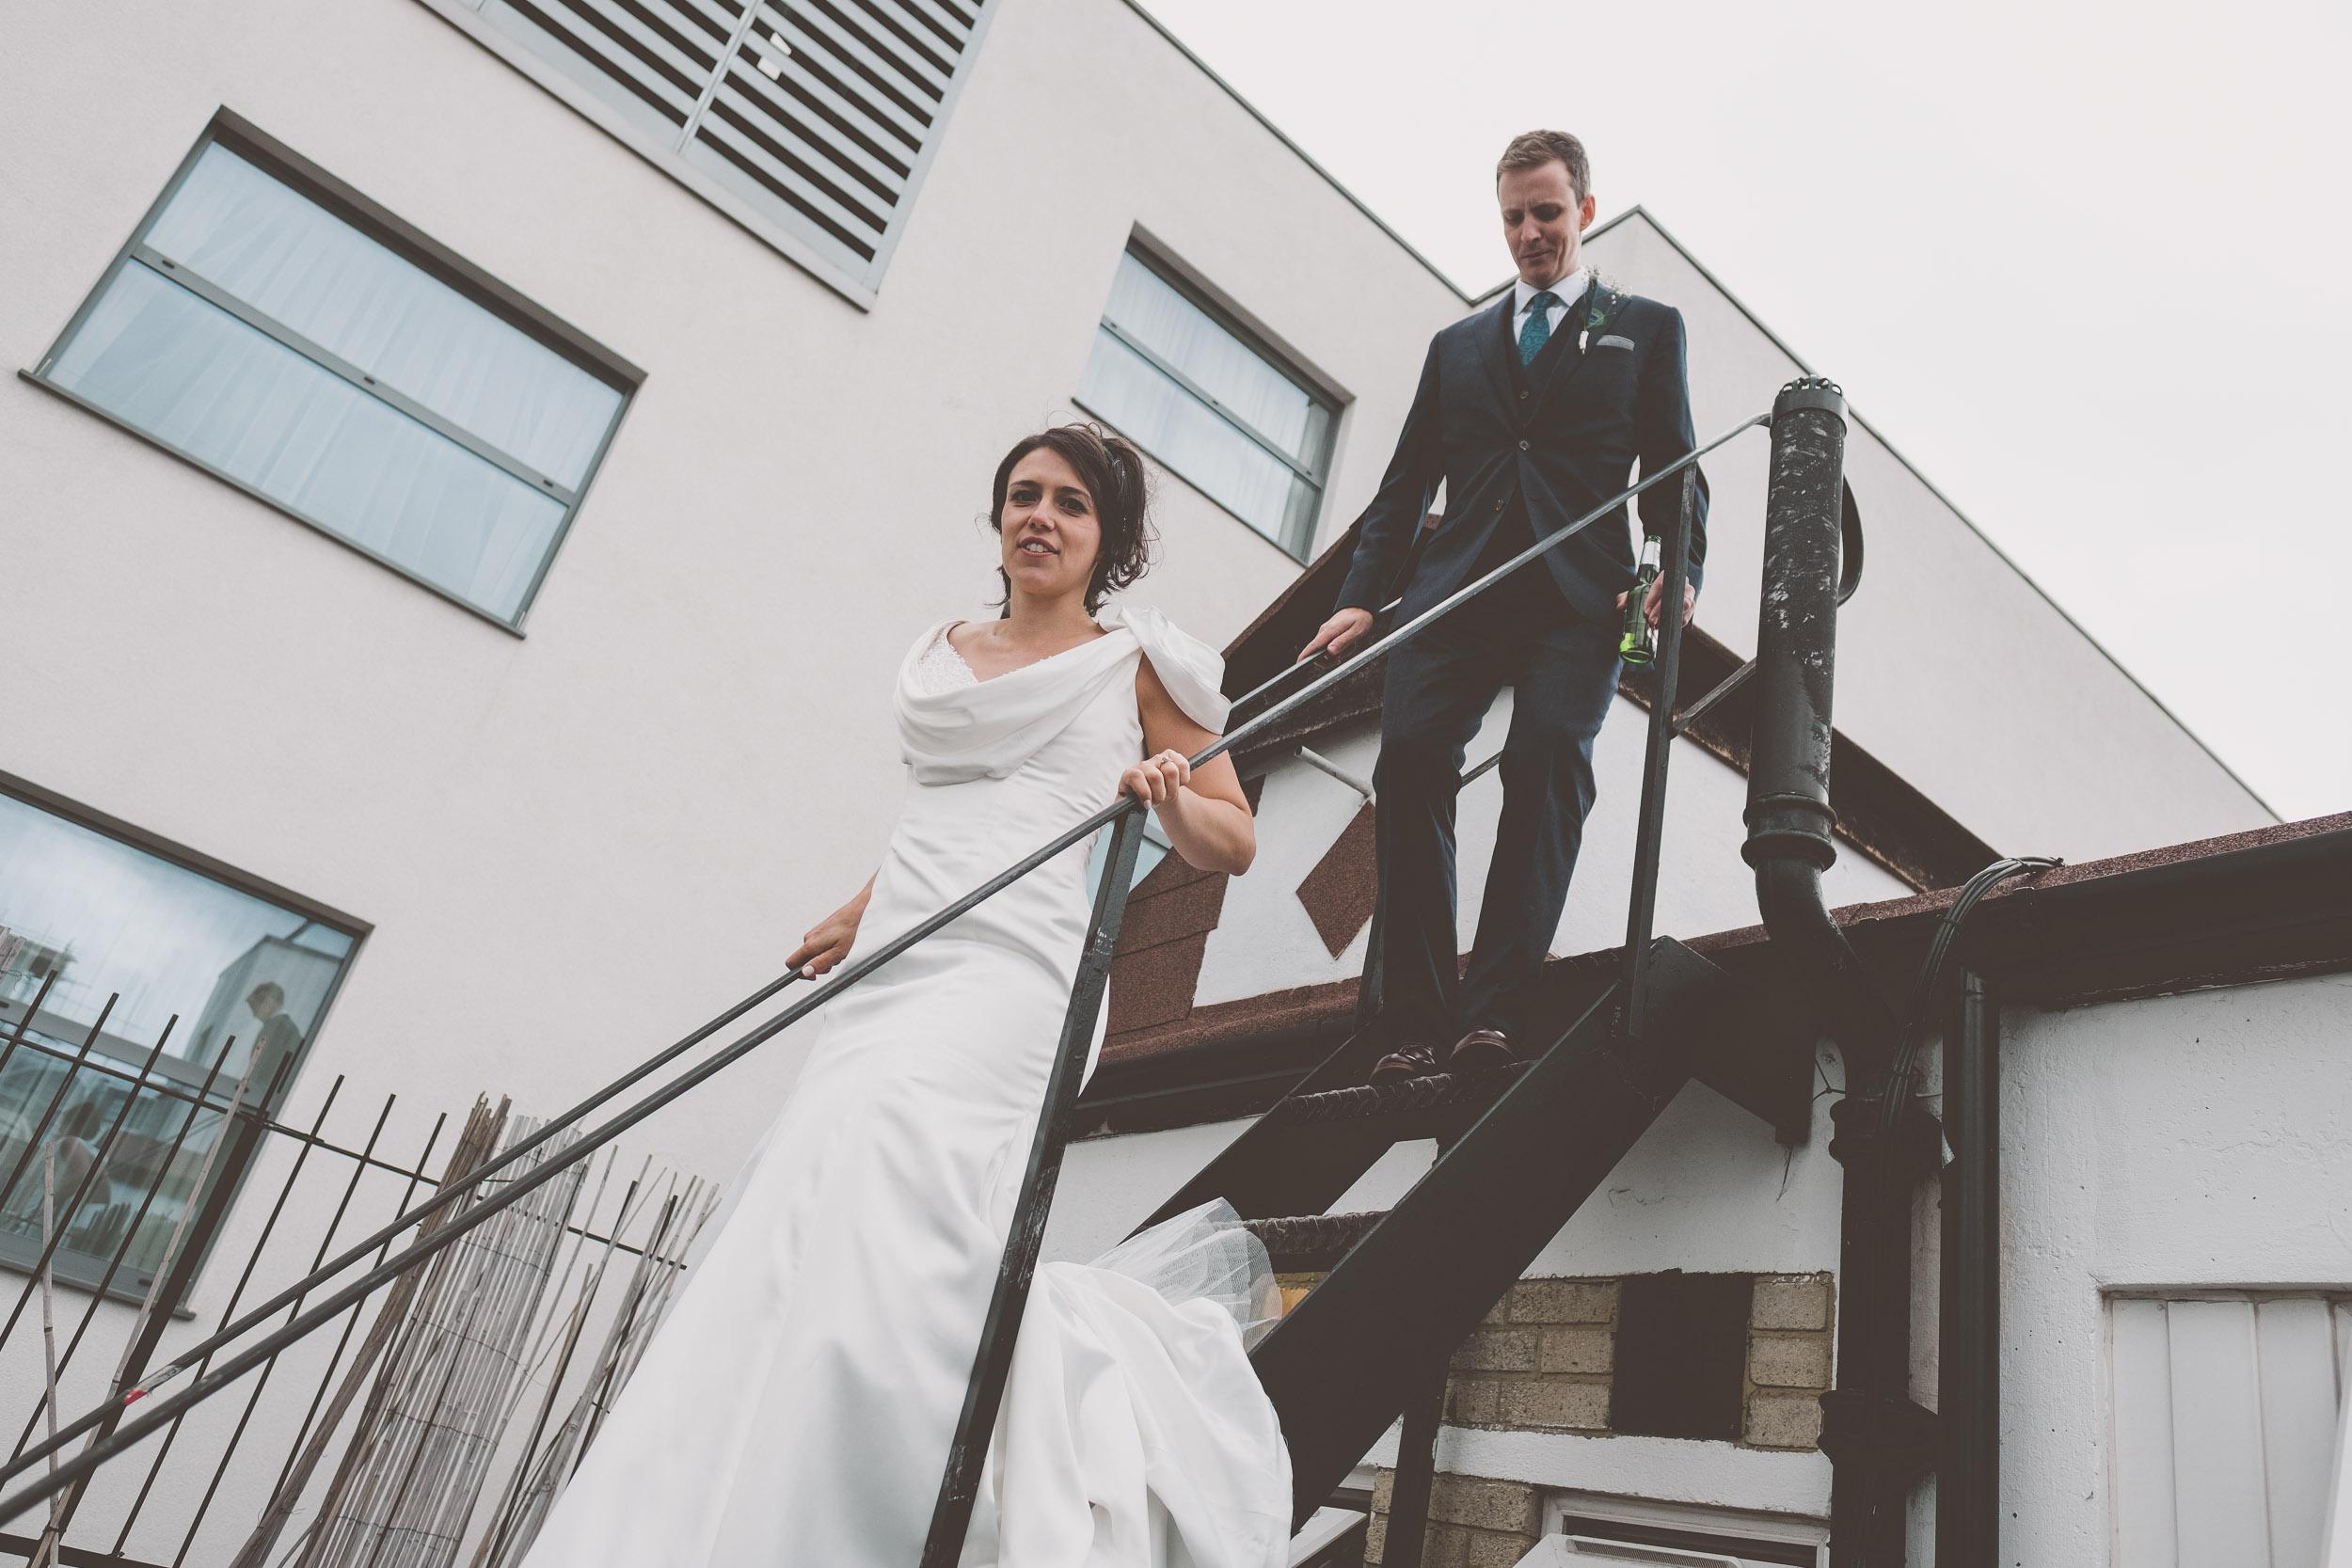 islington-town-hall-4th-floor-studios-wedding301.jpg